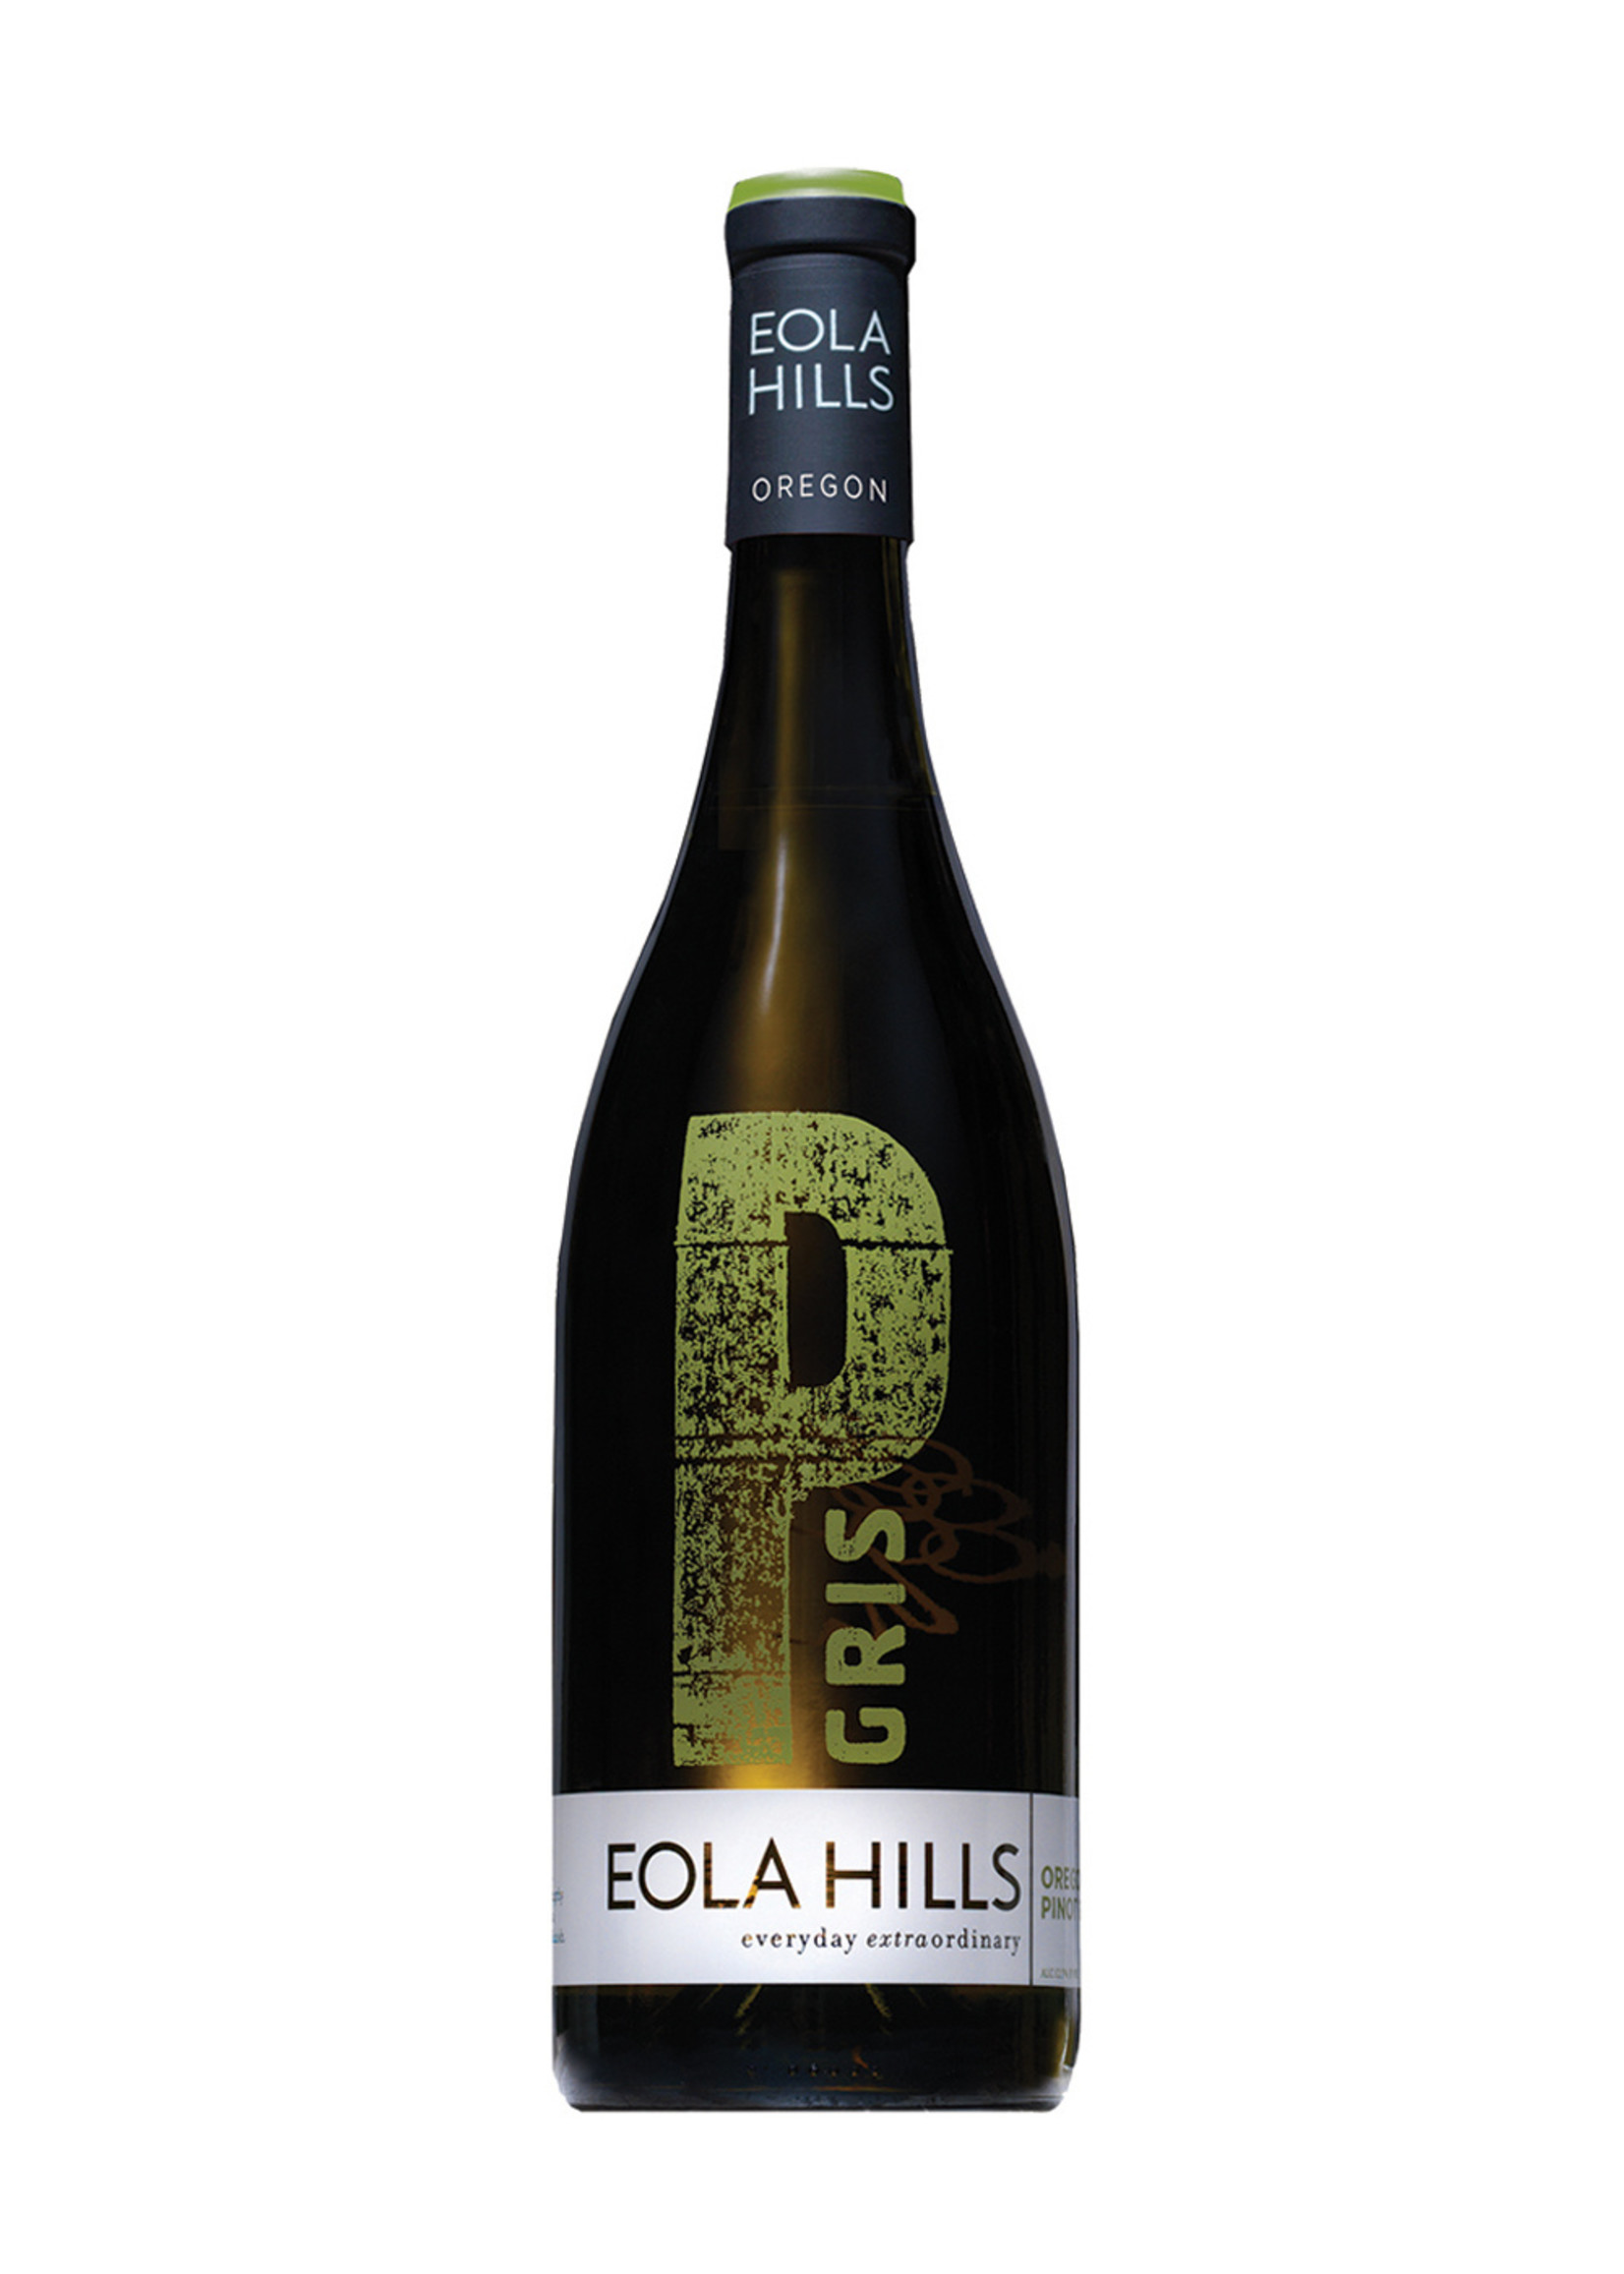 Eola Hills Pinot Gris